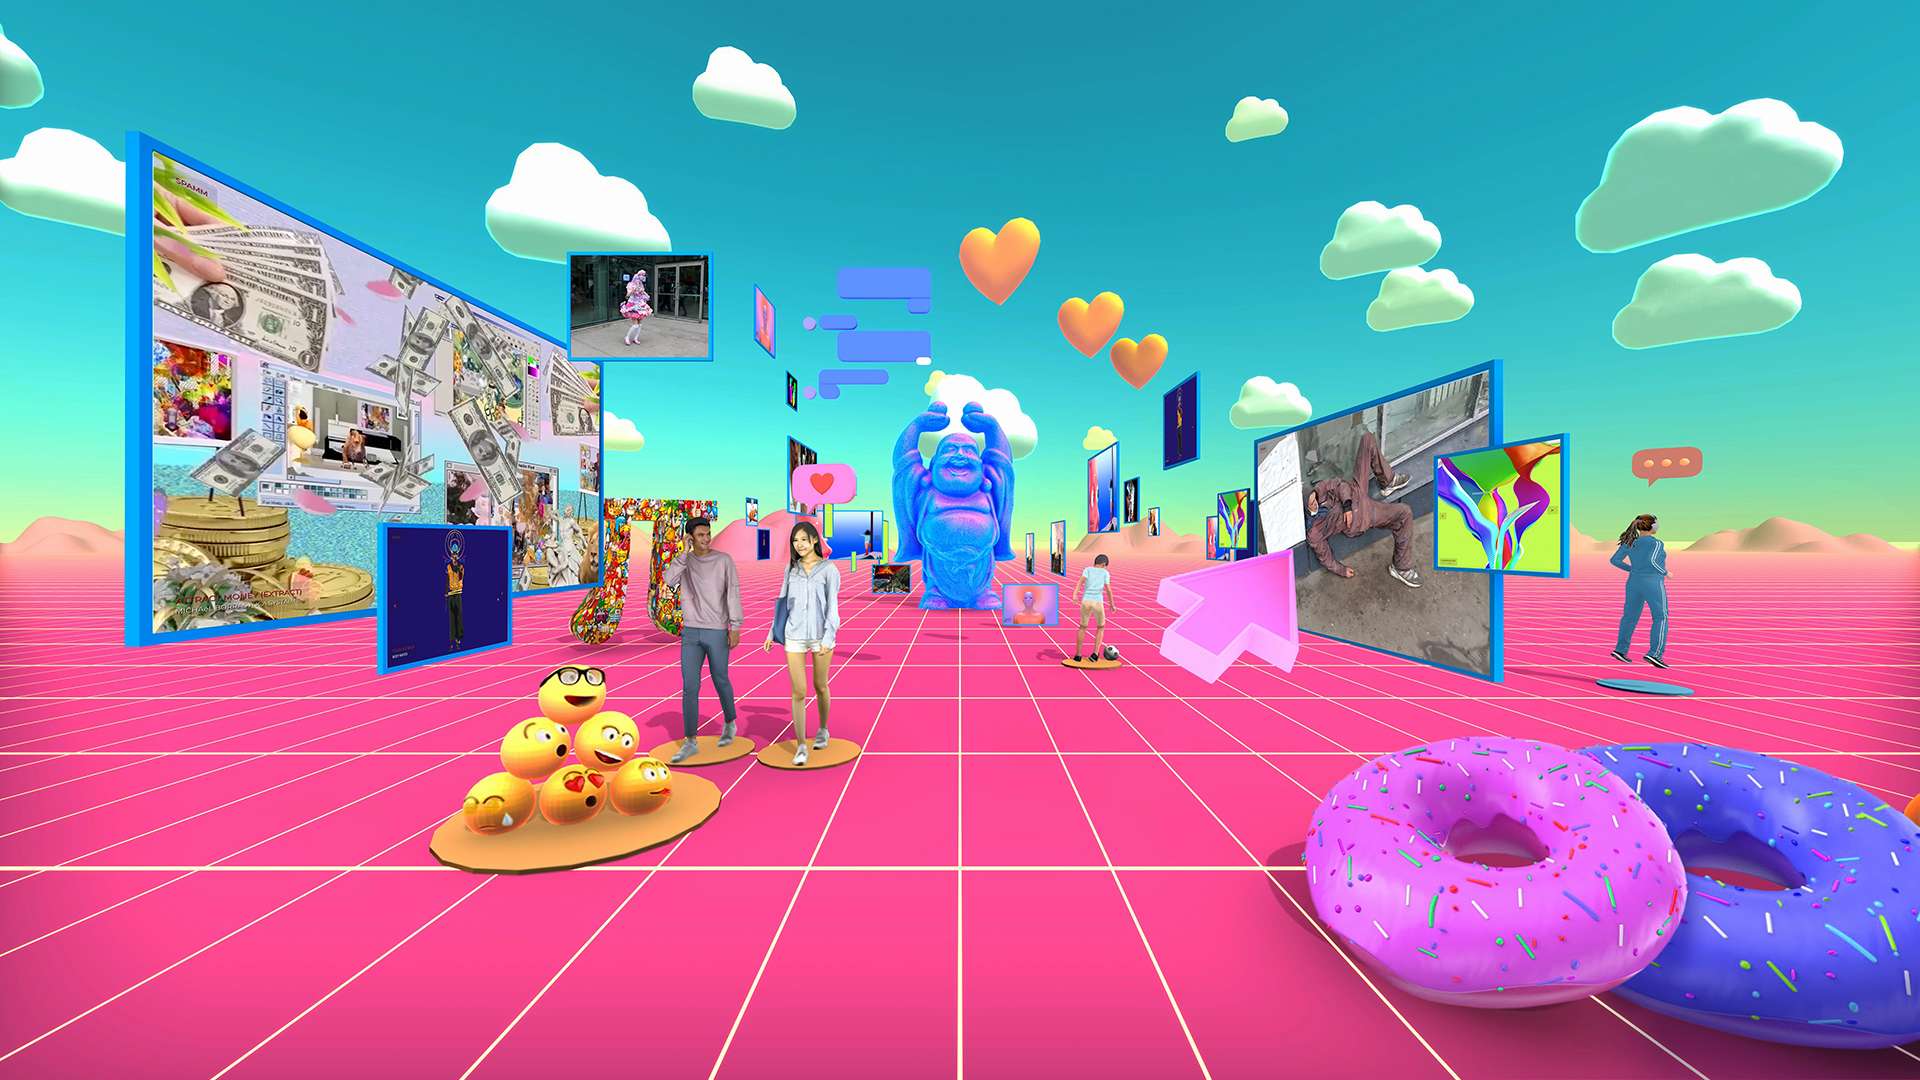 webbys-wonder-world-gate22-spamm-vr-experience-art-culure-2022